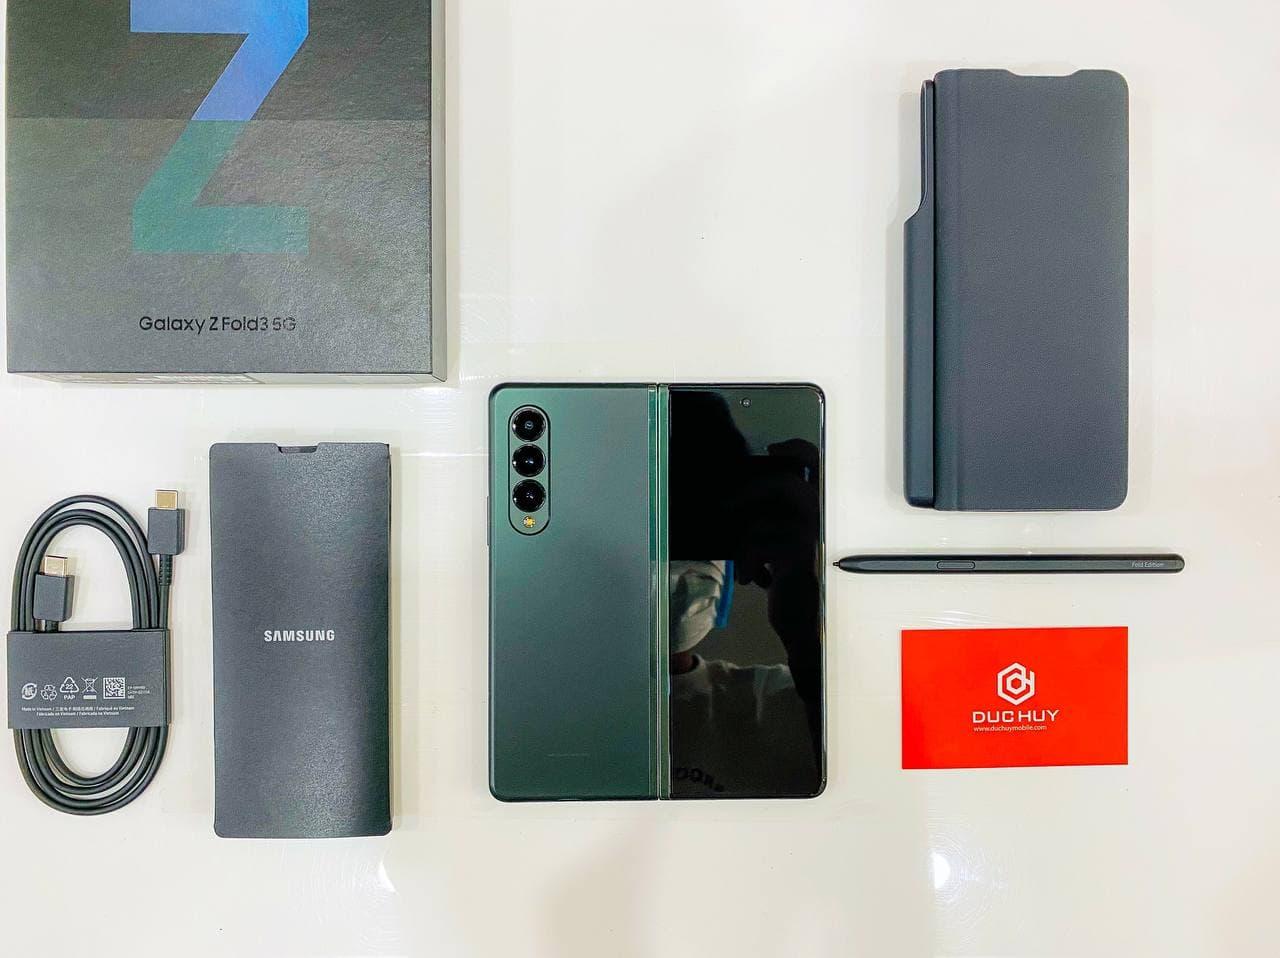 Samsung Galaxy Z Fold 3 Fullbox